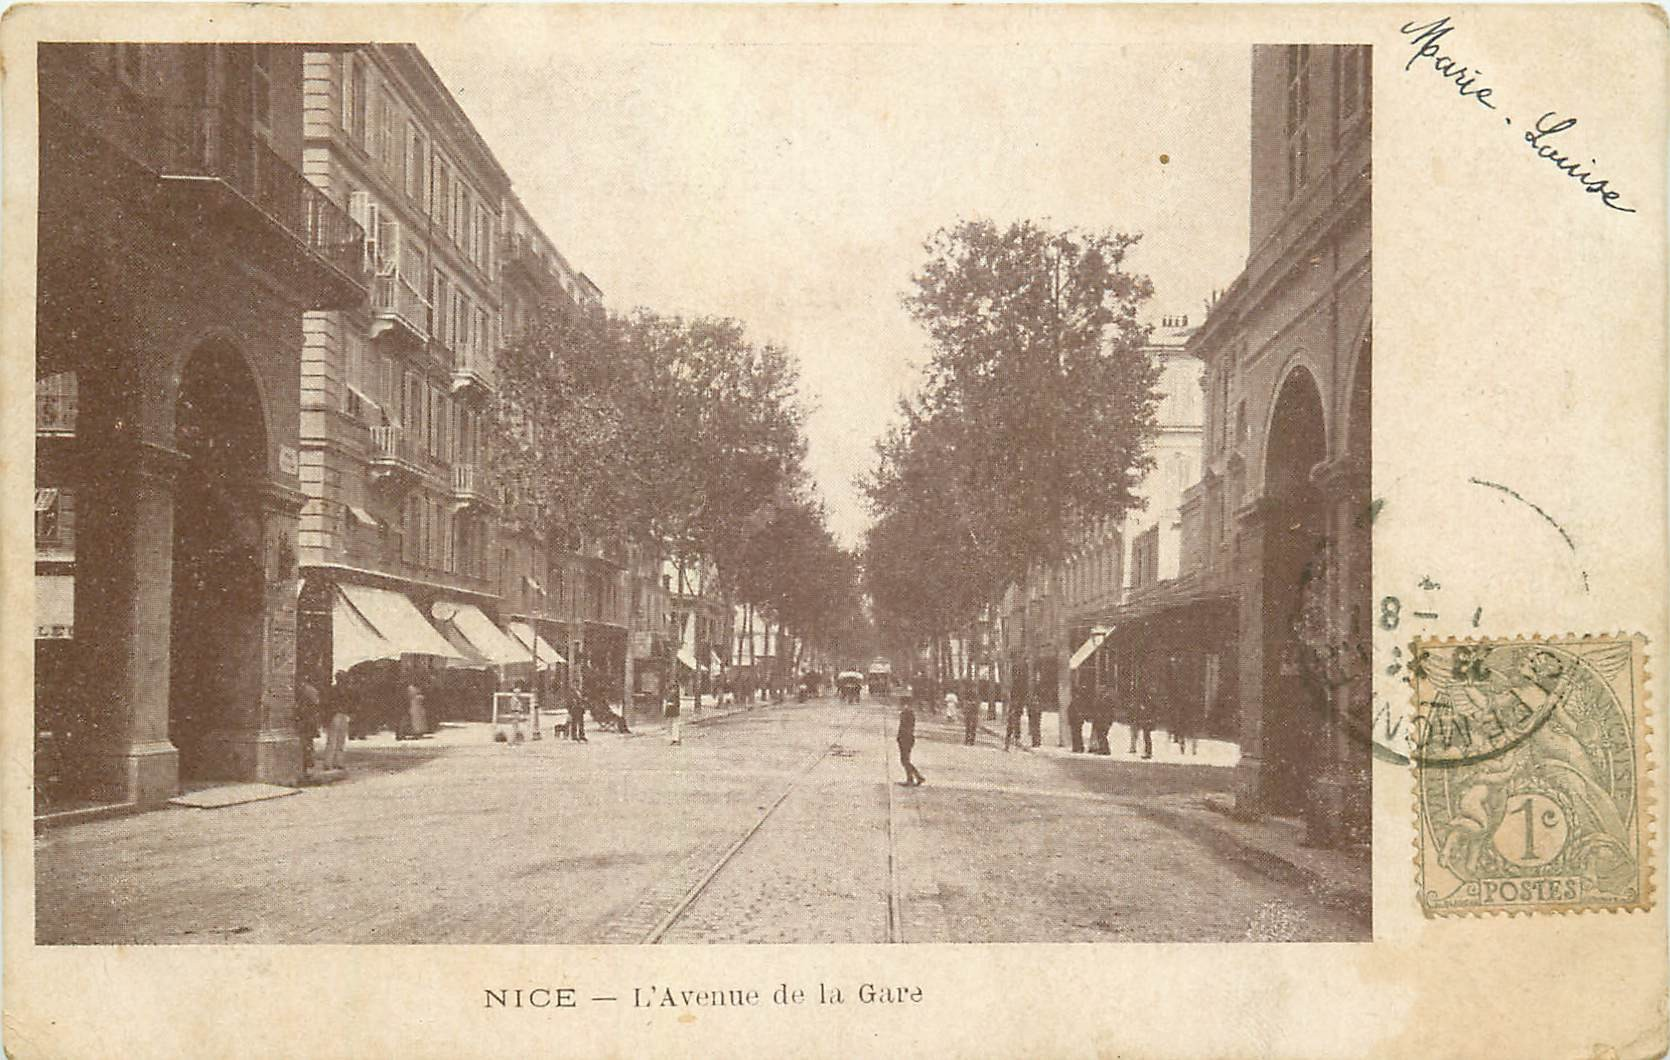 06 NICE. Avenue de la Gare timbre 1 centime vers 1900...